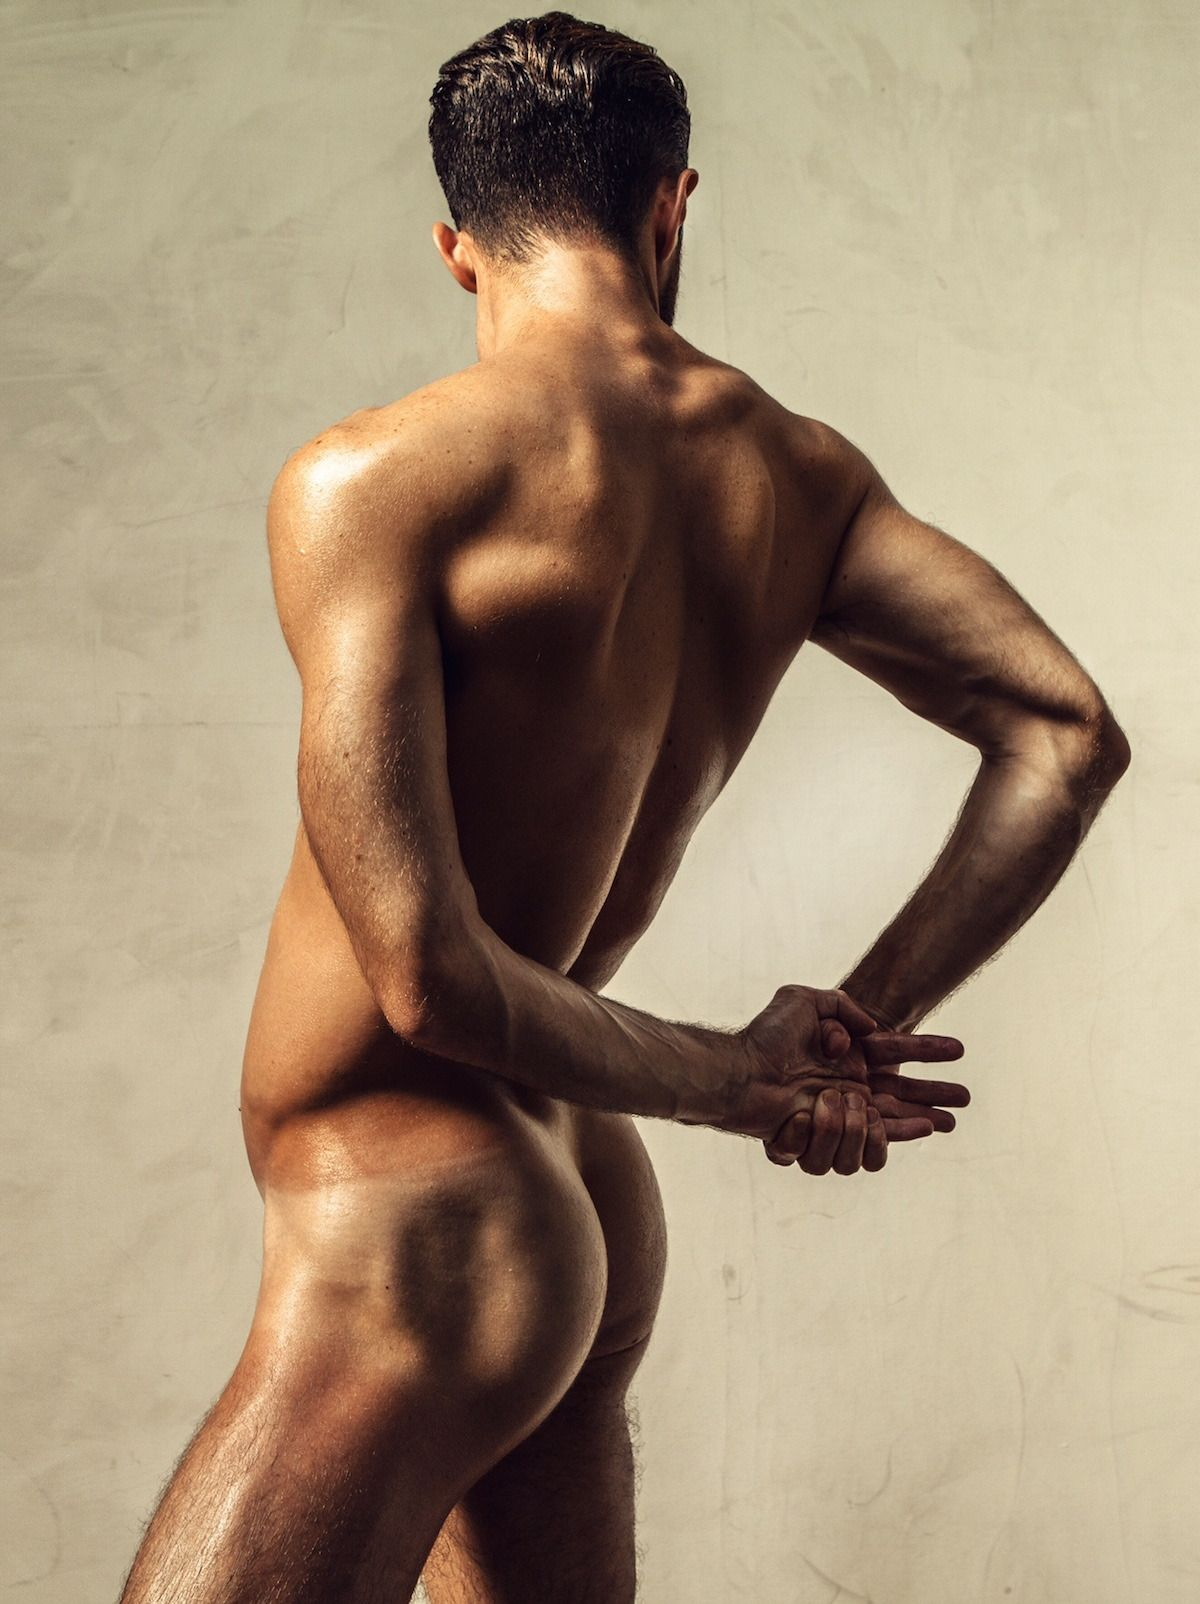 Pics of kasey khane naked, violaciones sexy